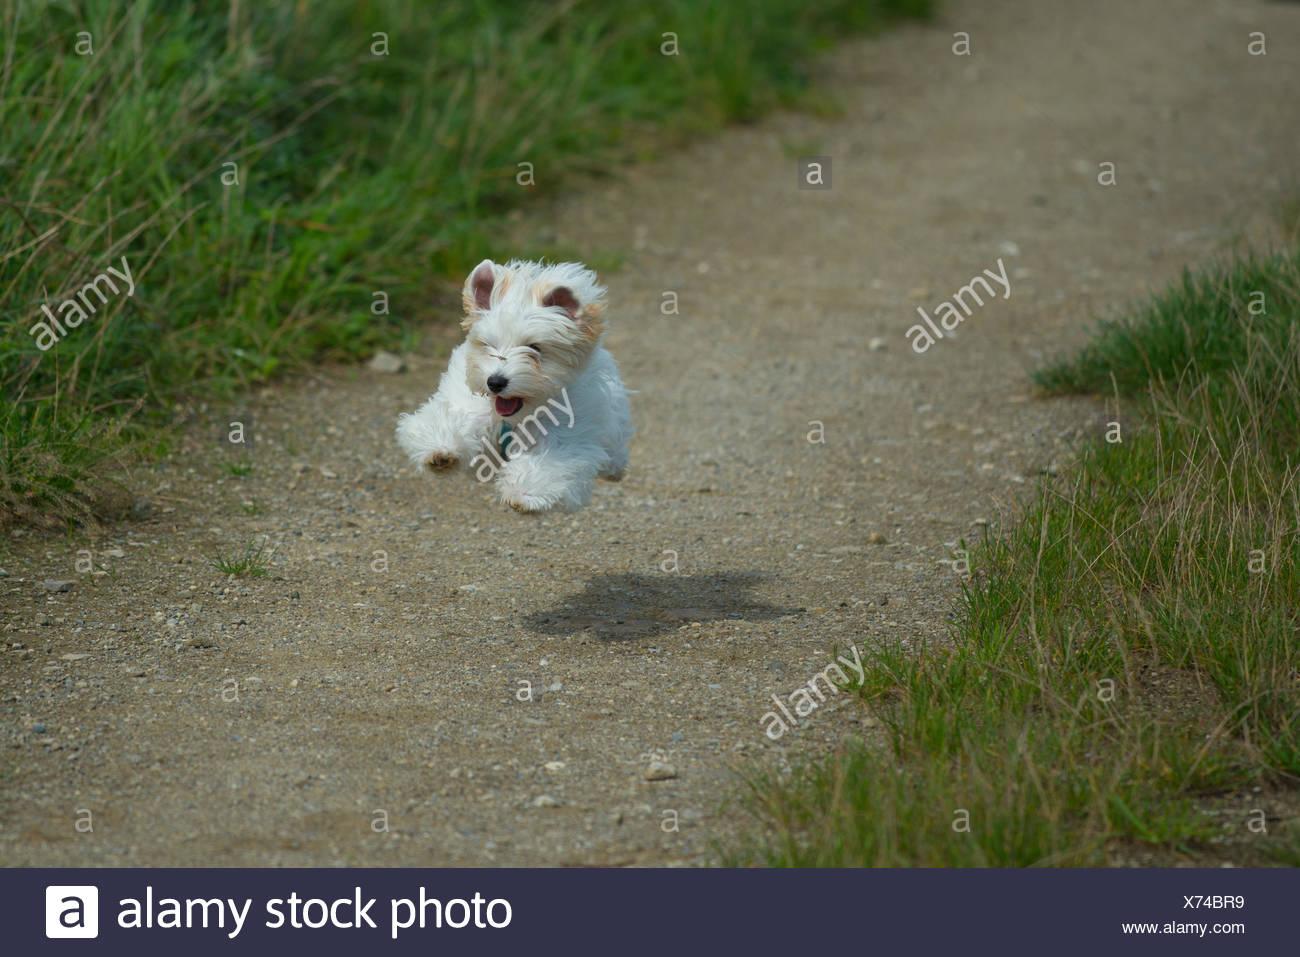 bouncing little white dog - Stock Image